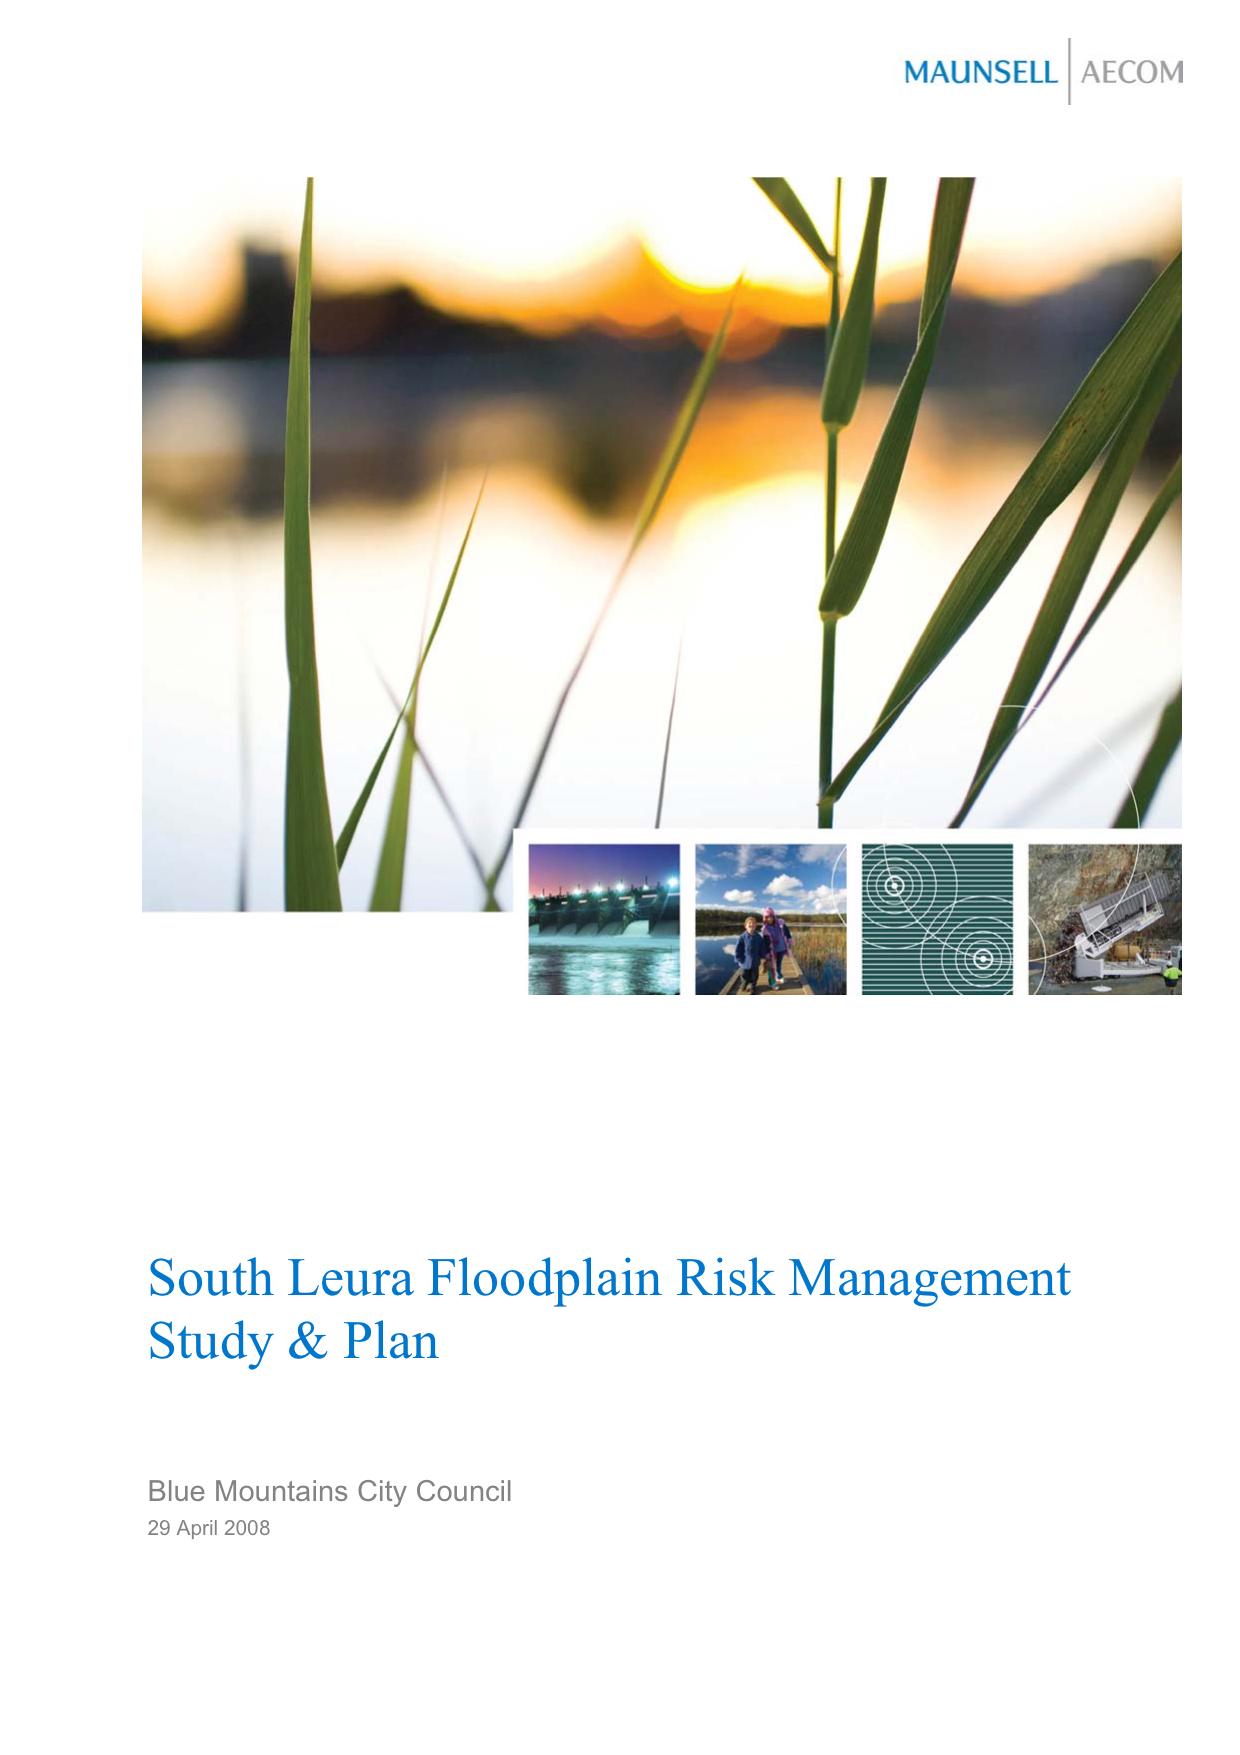 South Leura Floodplain Risk Management Study and Plan